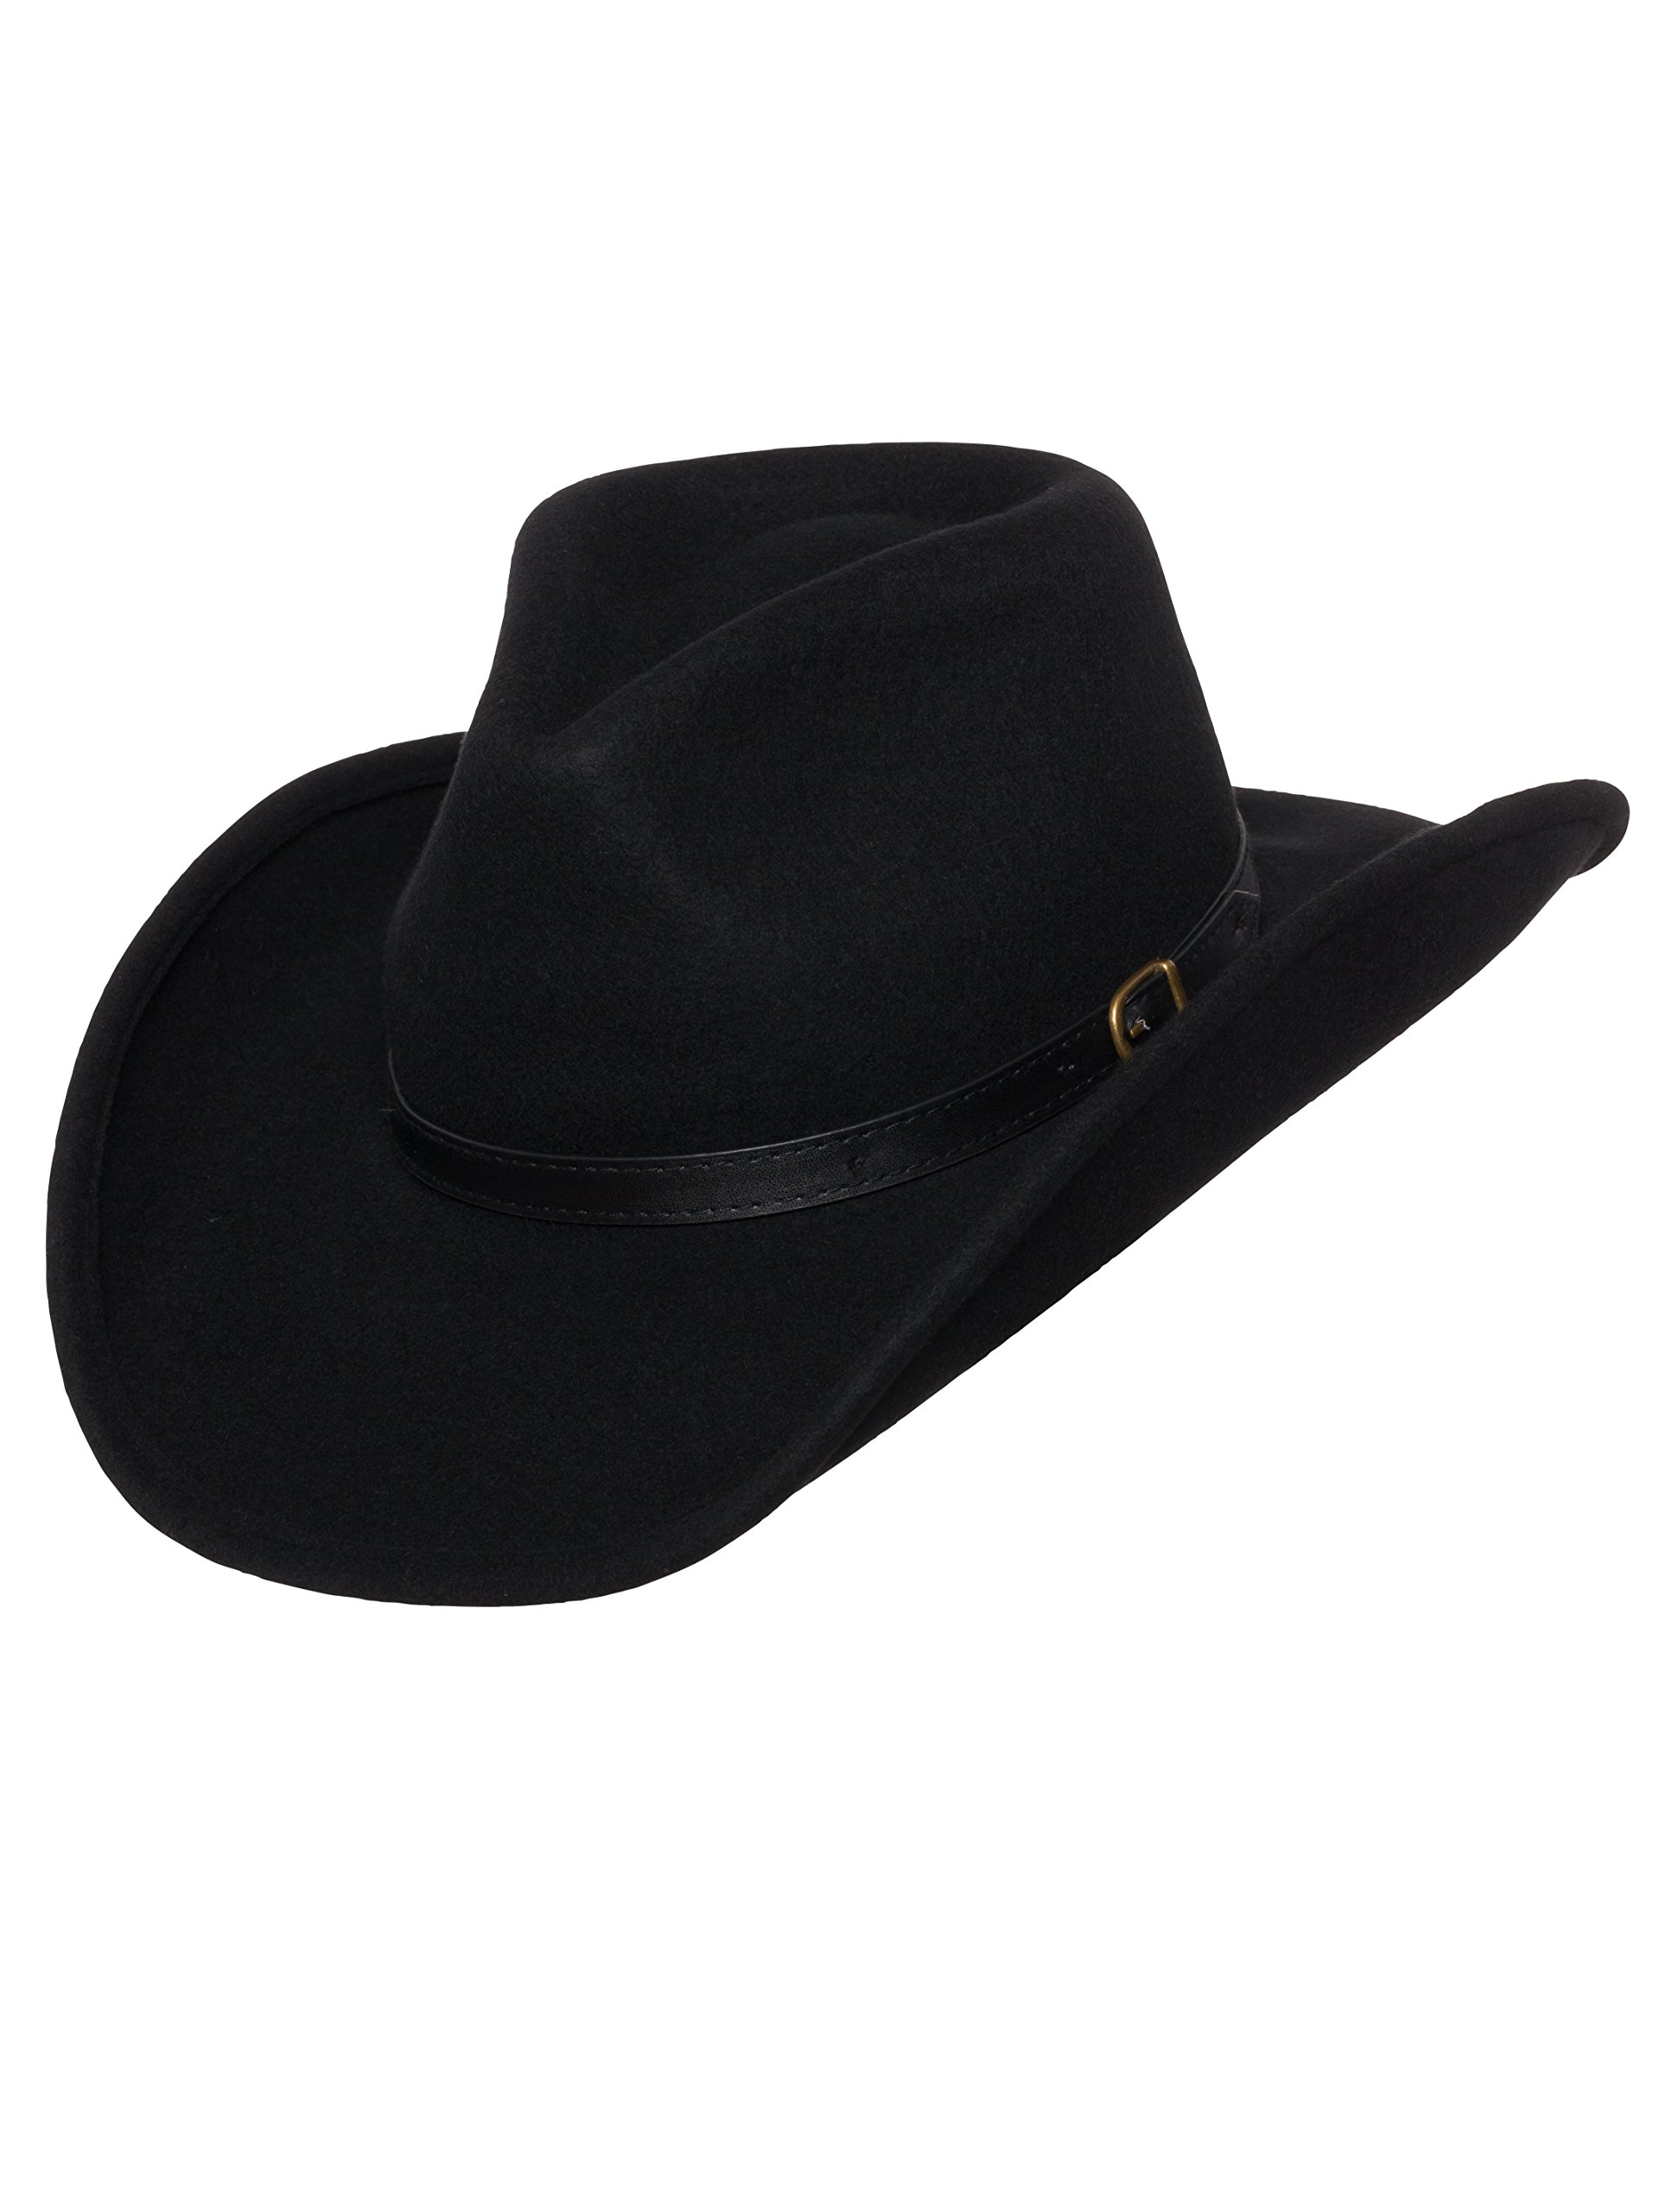 Men's Outback Wool Cowboy Hat Dakota Black Shapeable Western Felt by Silver Canyon, Black, Medium